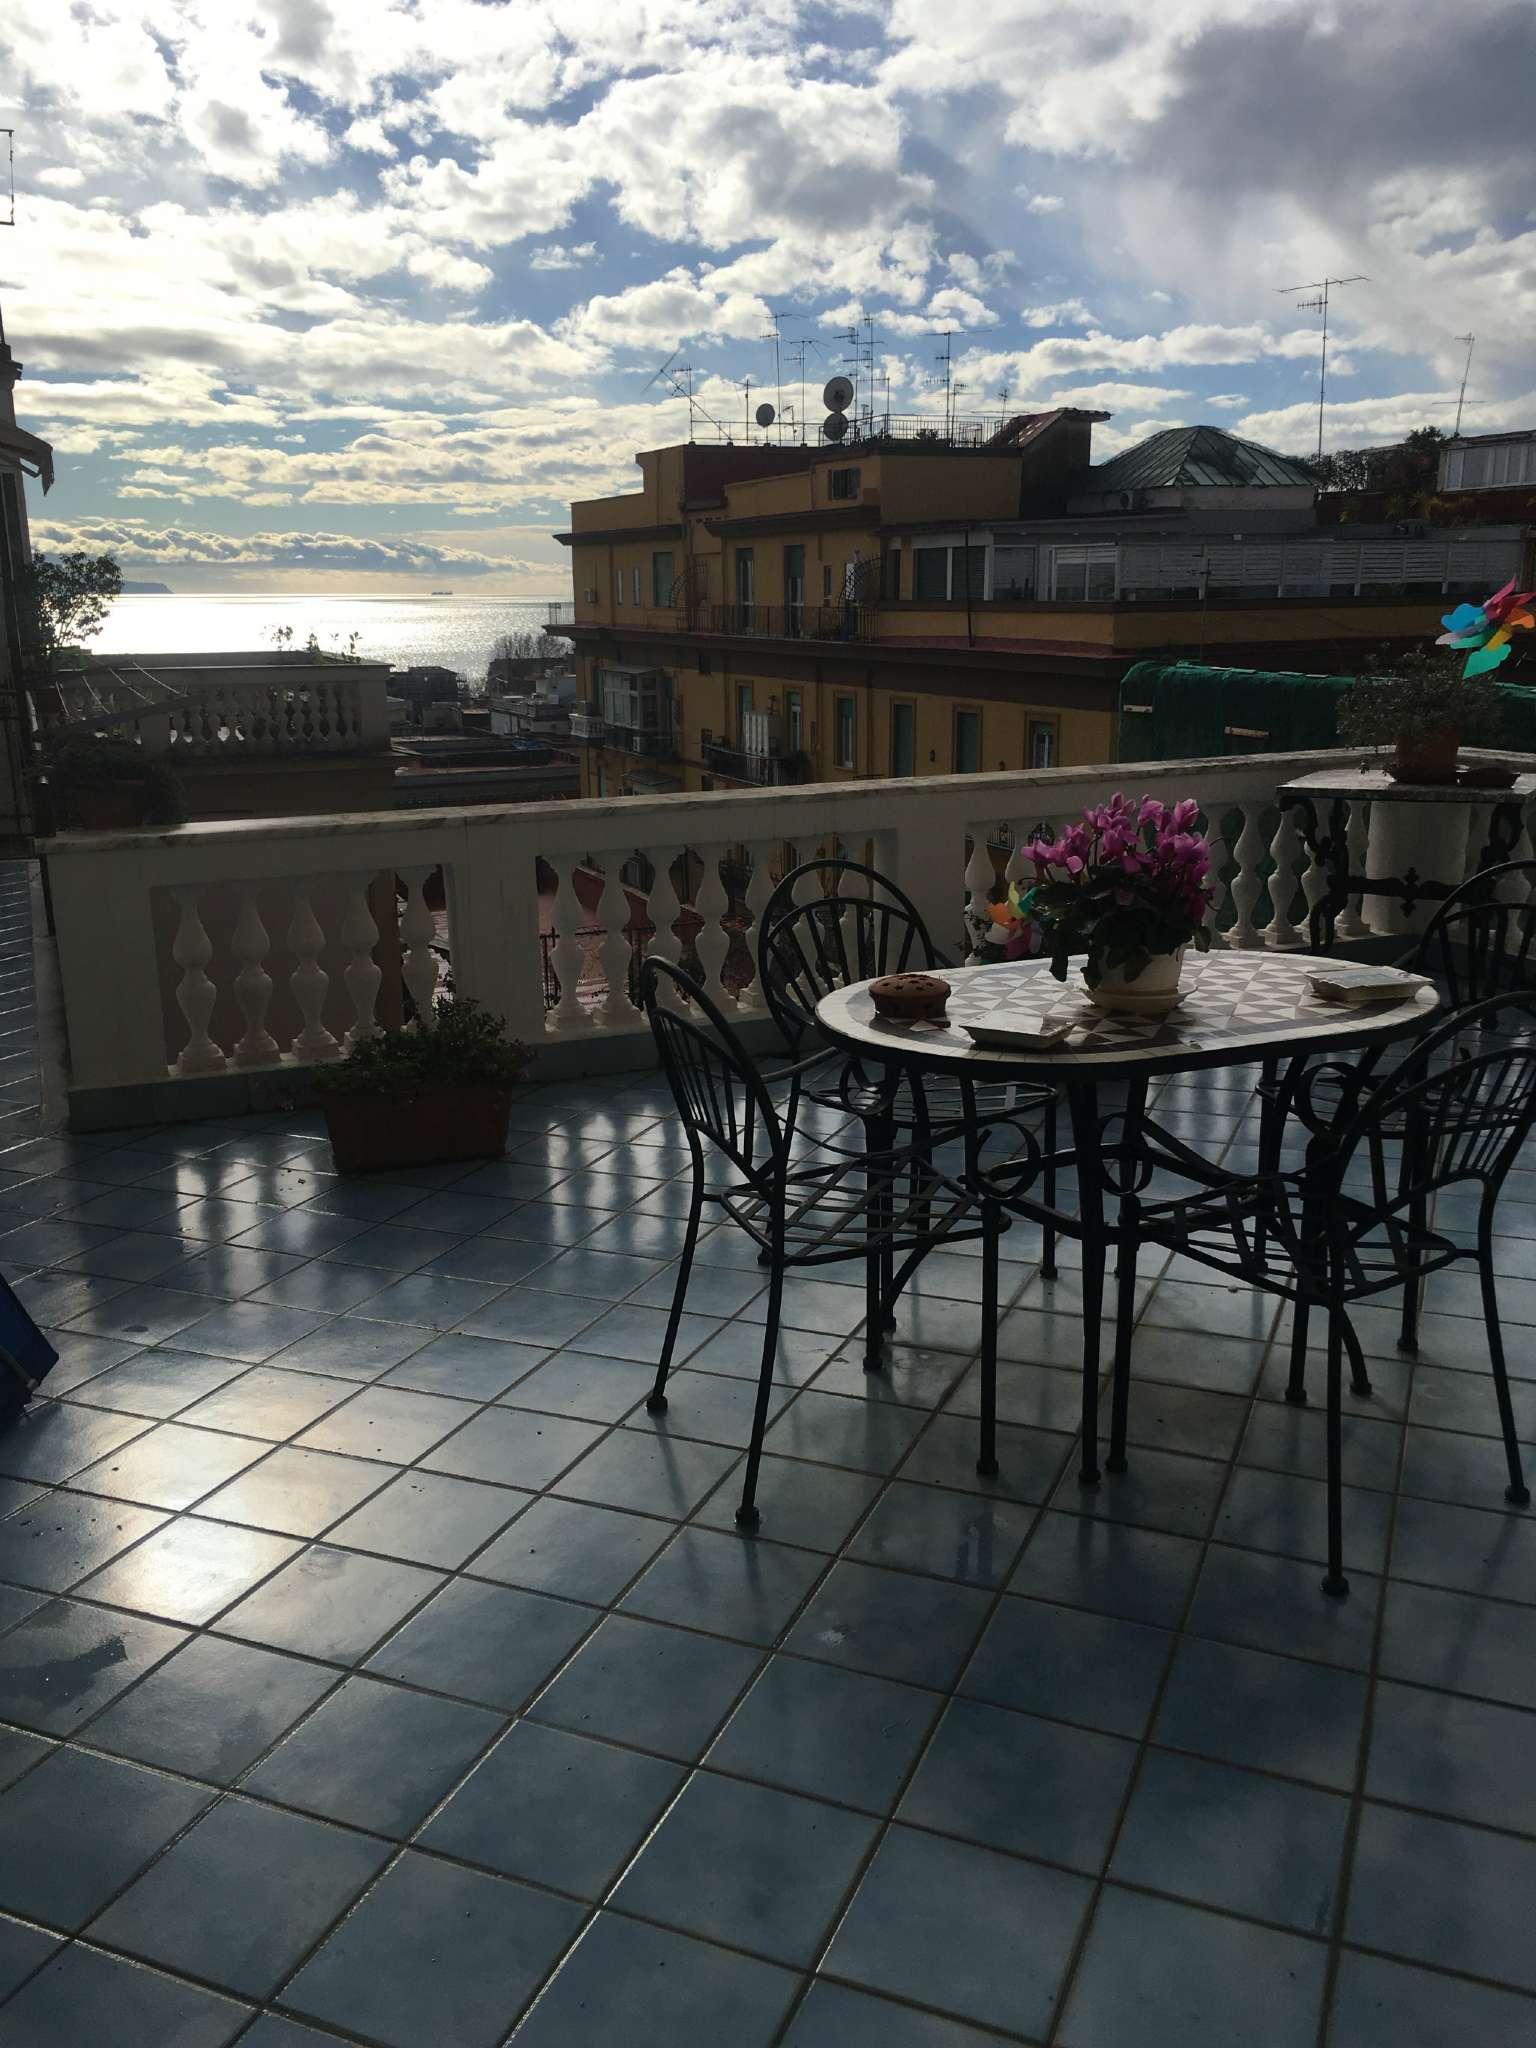 Stunning Casa Con Terrazzo Napoli Photos - Idee Arredamento Casa ...